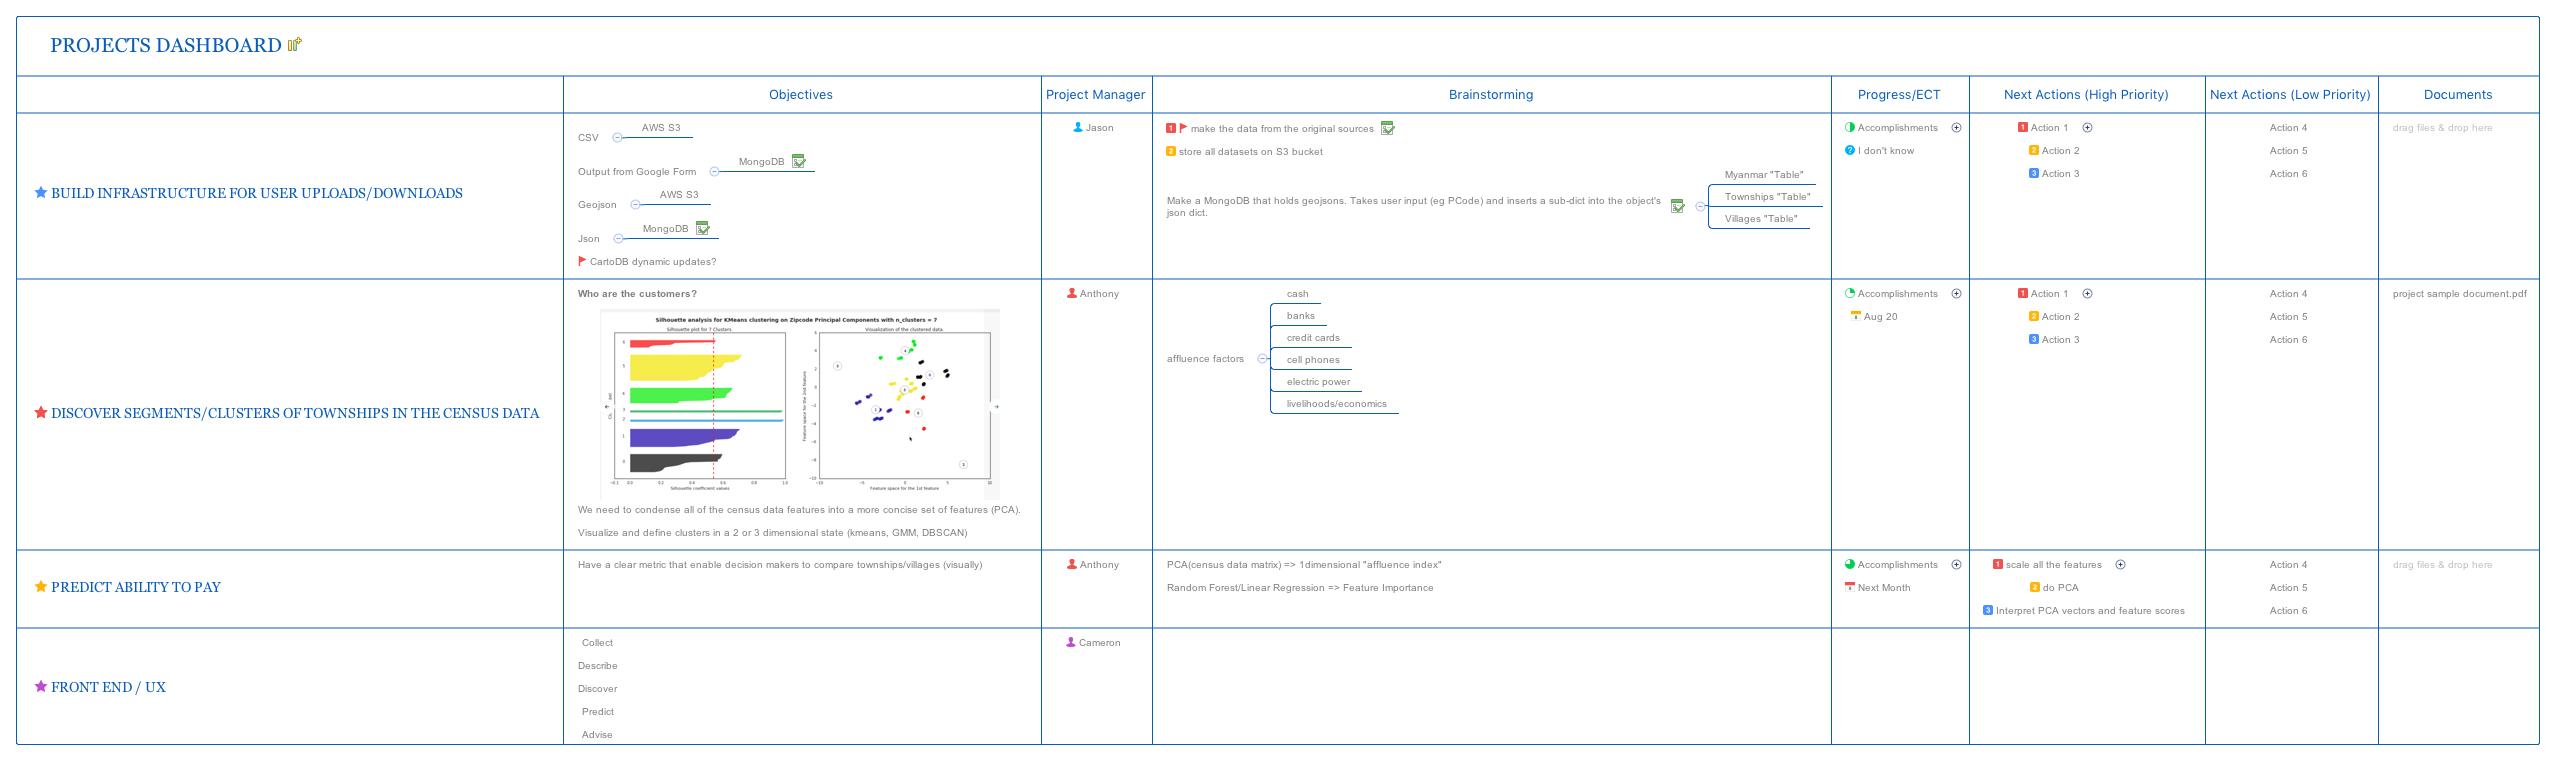 Cartesisan Projects Dashboard